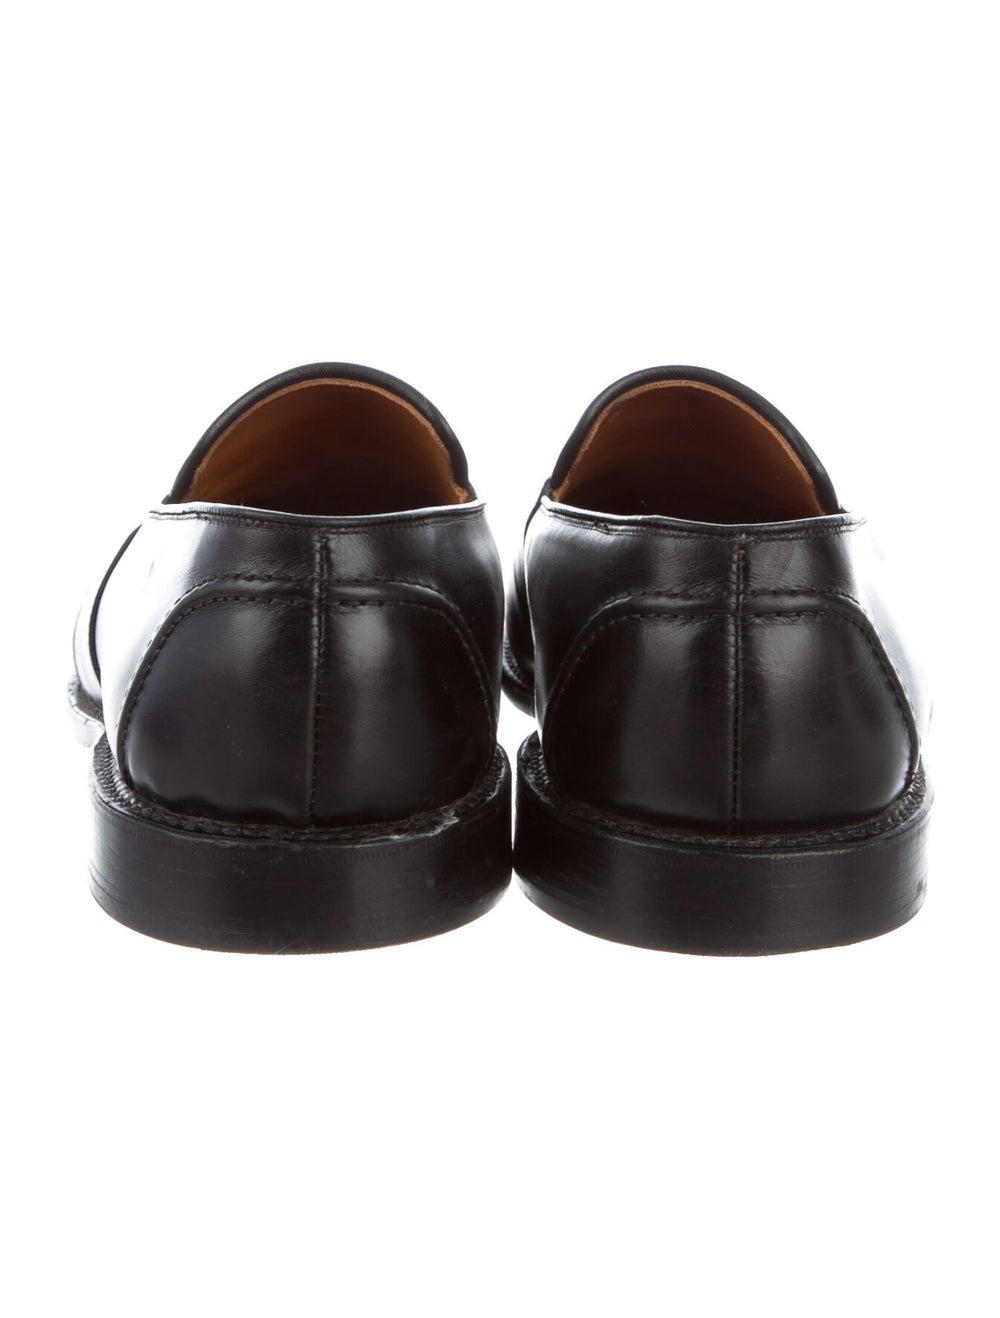 Allen Edmonds Leather Penny Loafers black - image 4